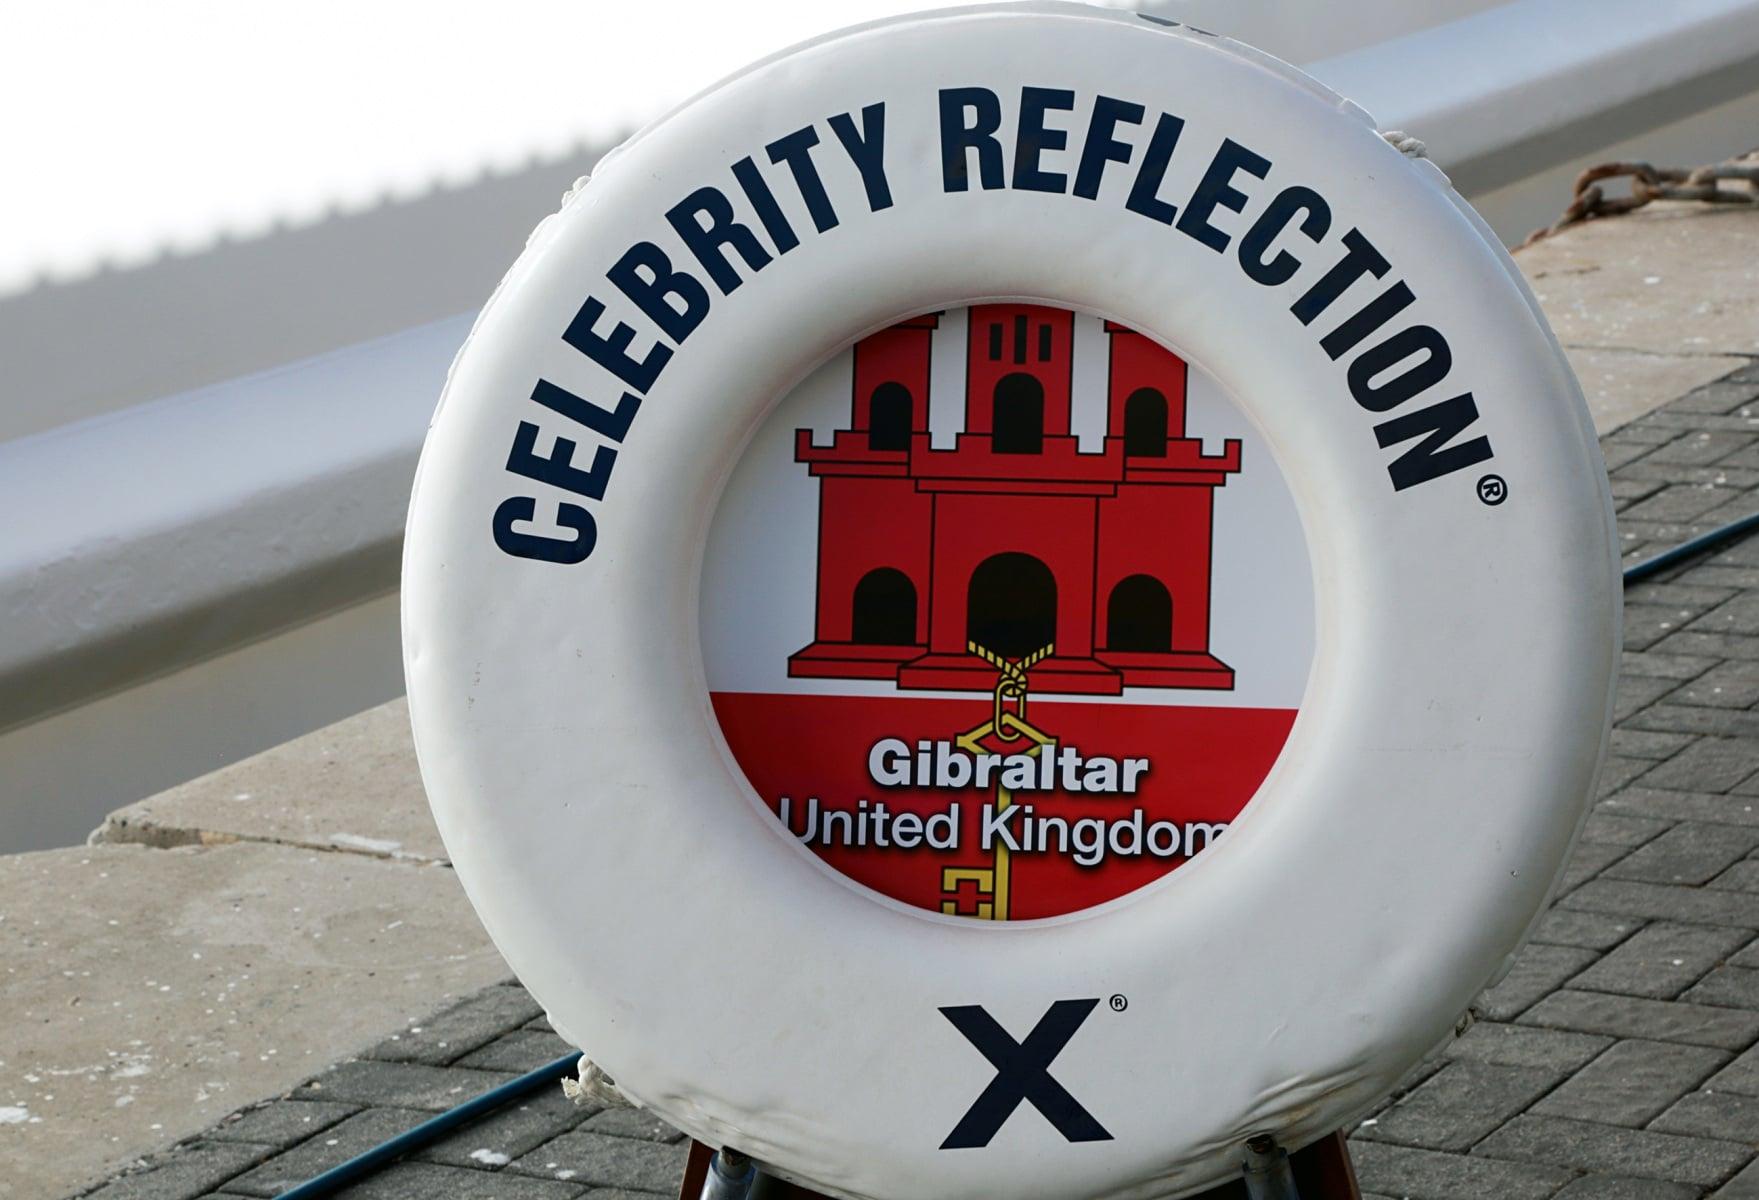 08-may-2017-28visita-inaugural-del-crucero-celebrity-or-reflection-a-gibraltar_34606283441_o